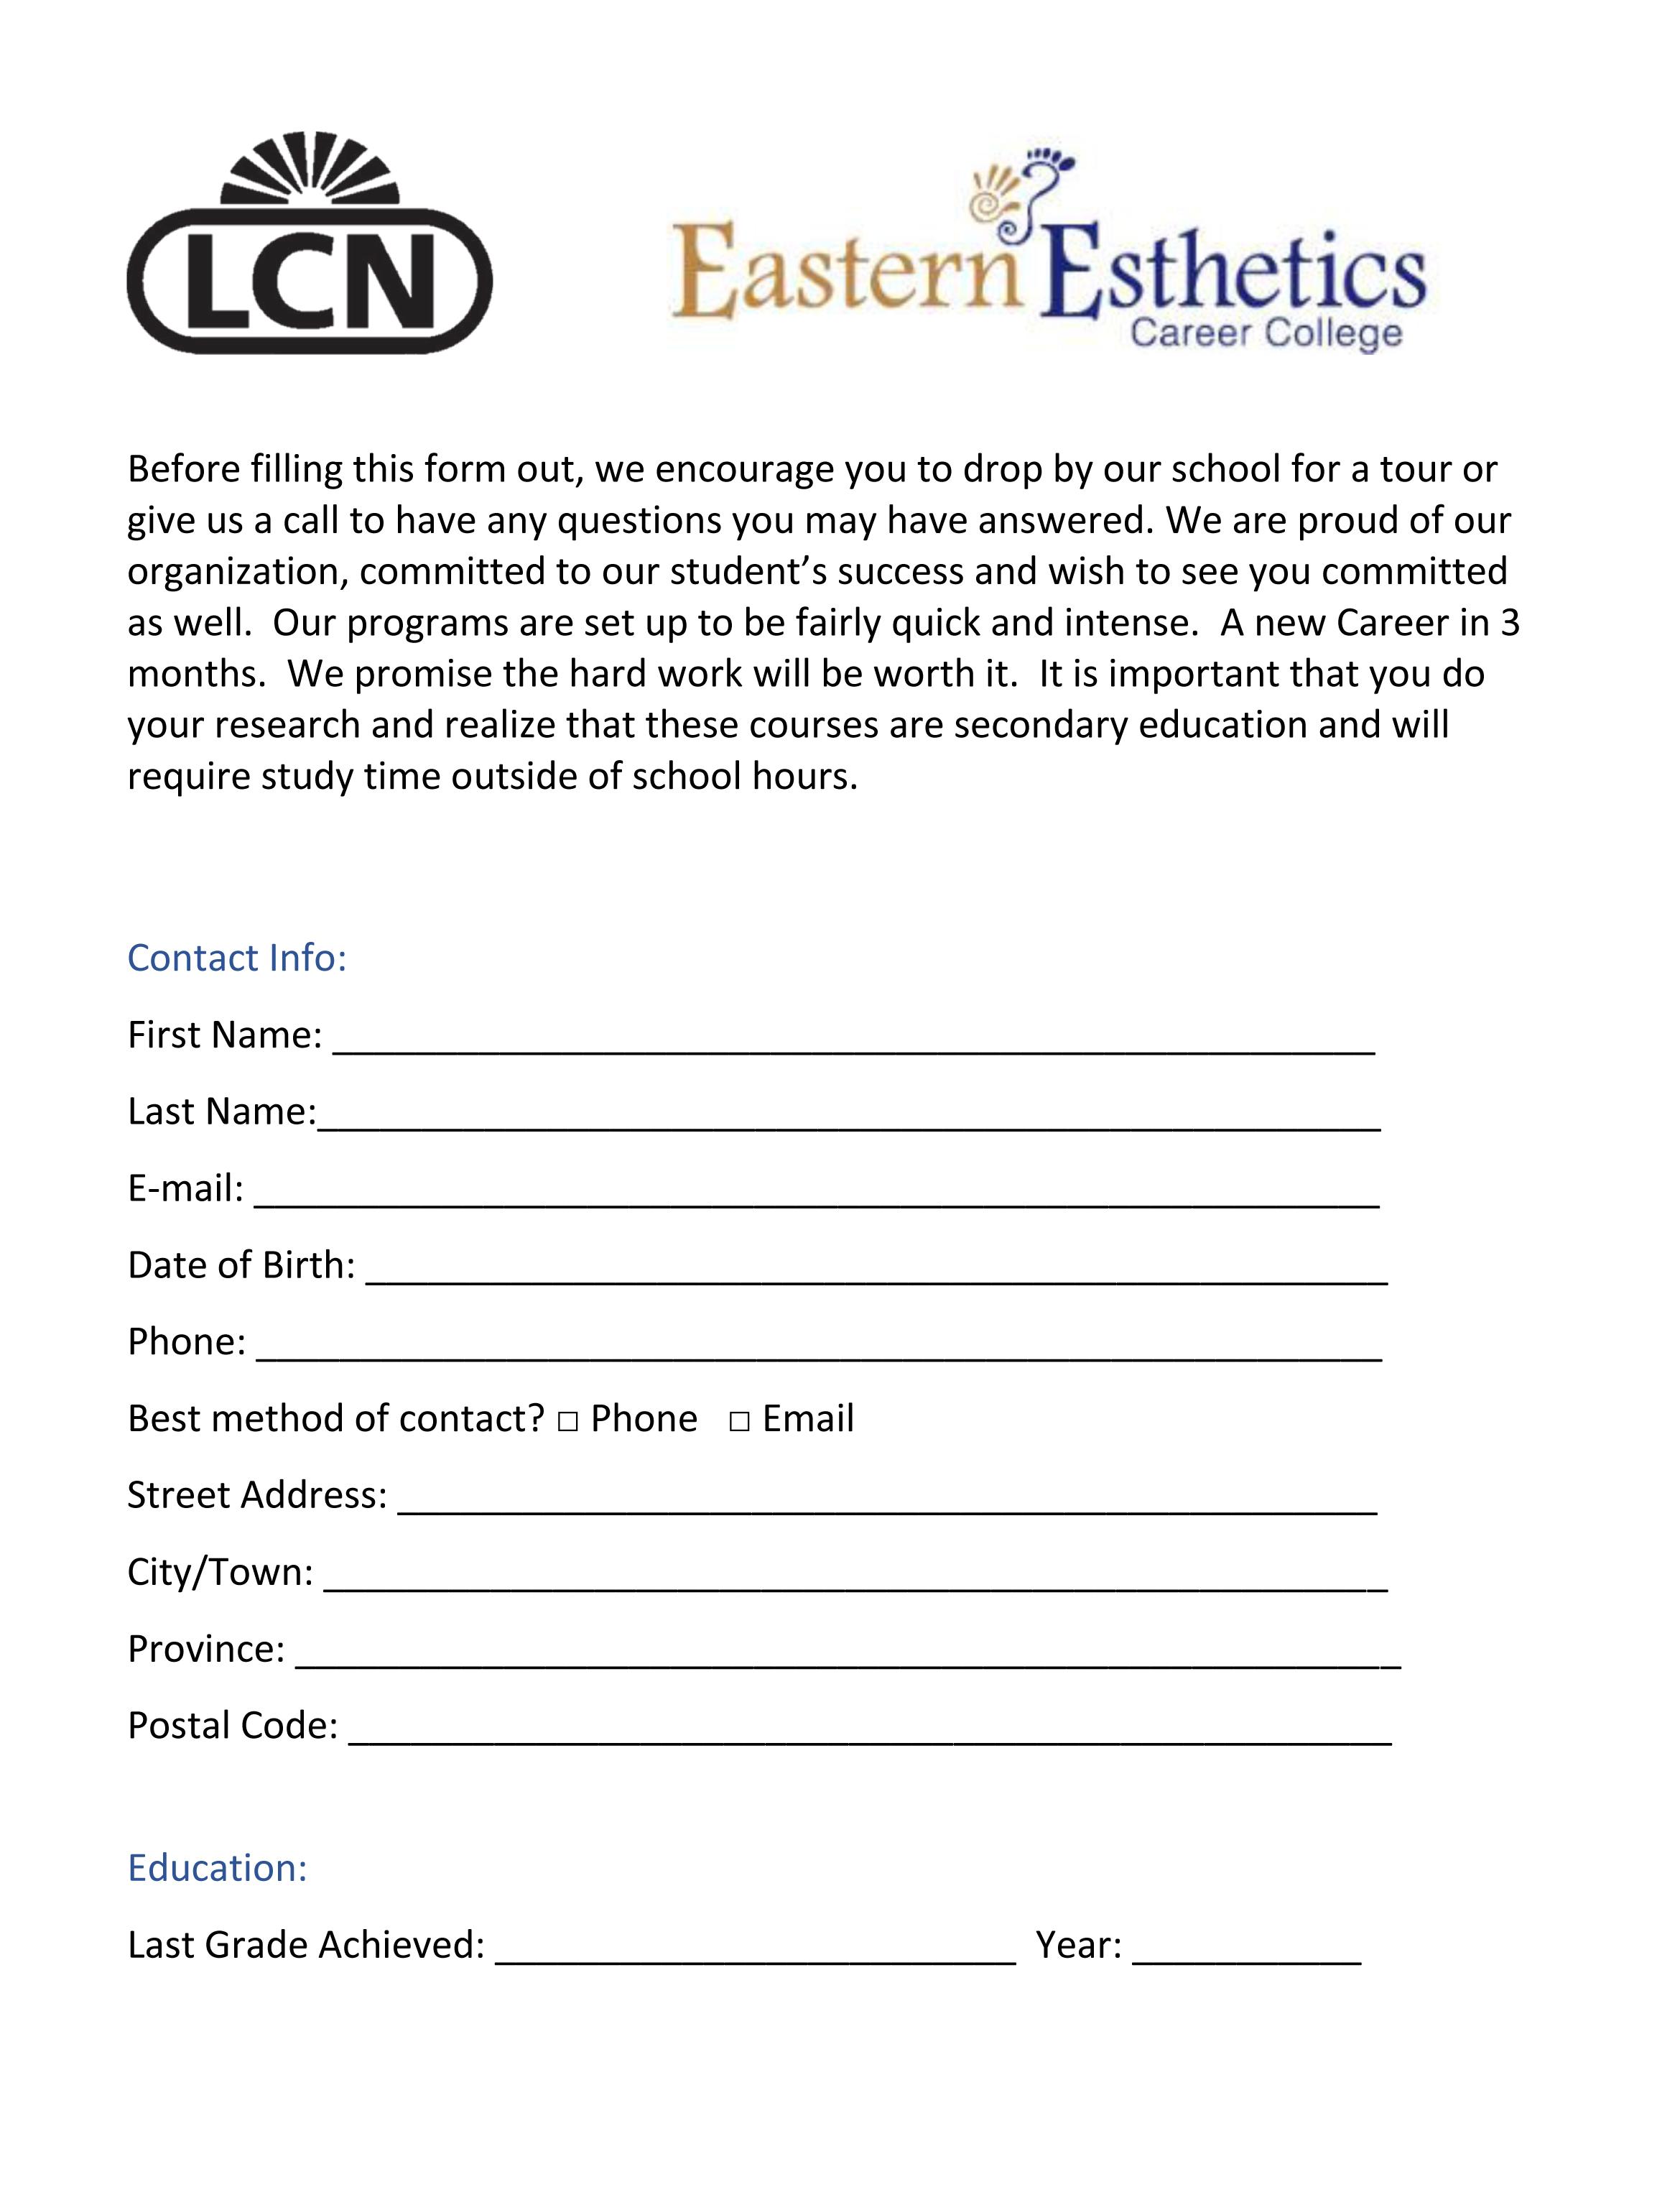 LCN Canada East - Nail Tech Program